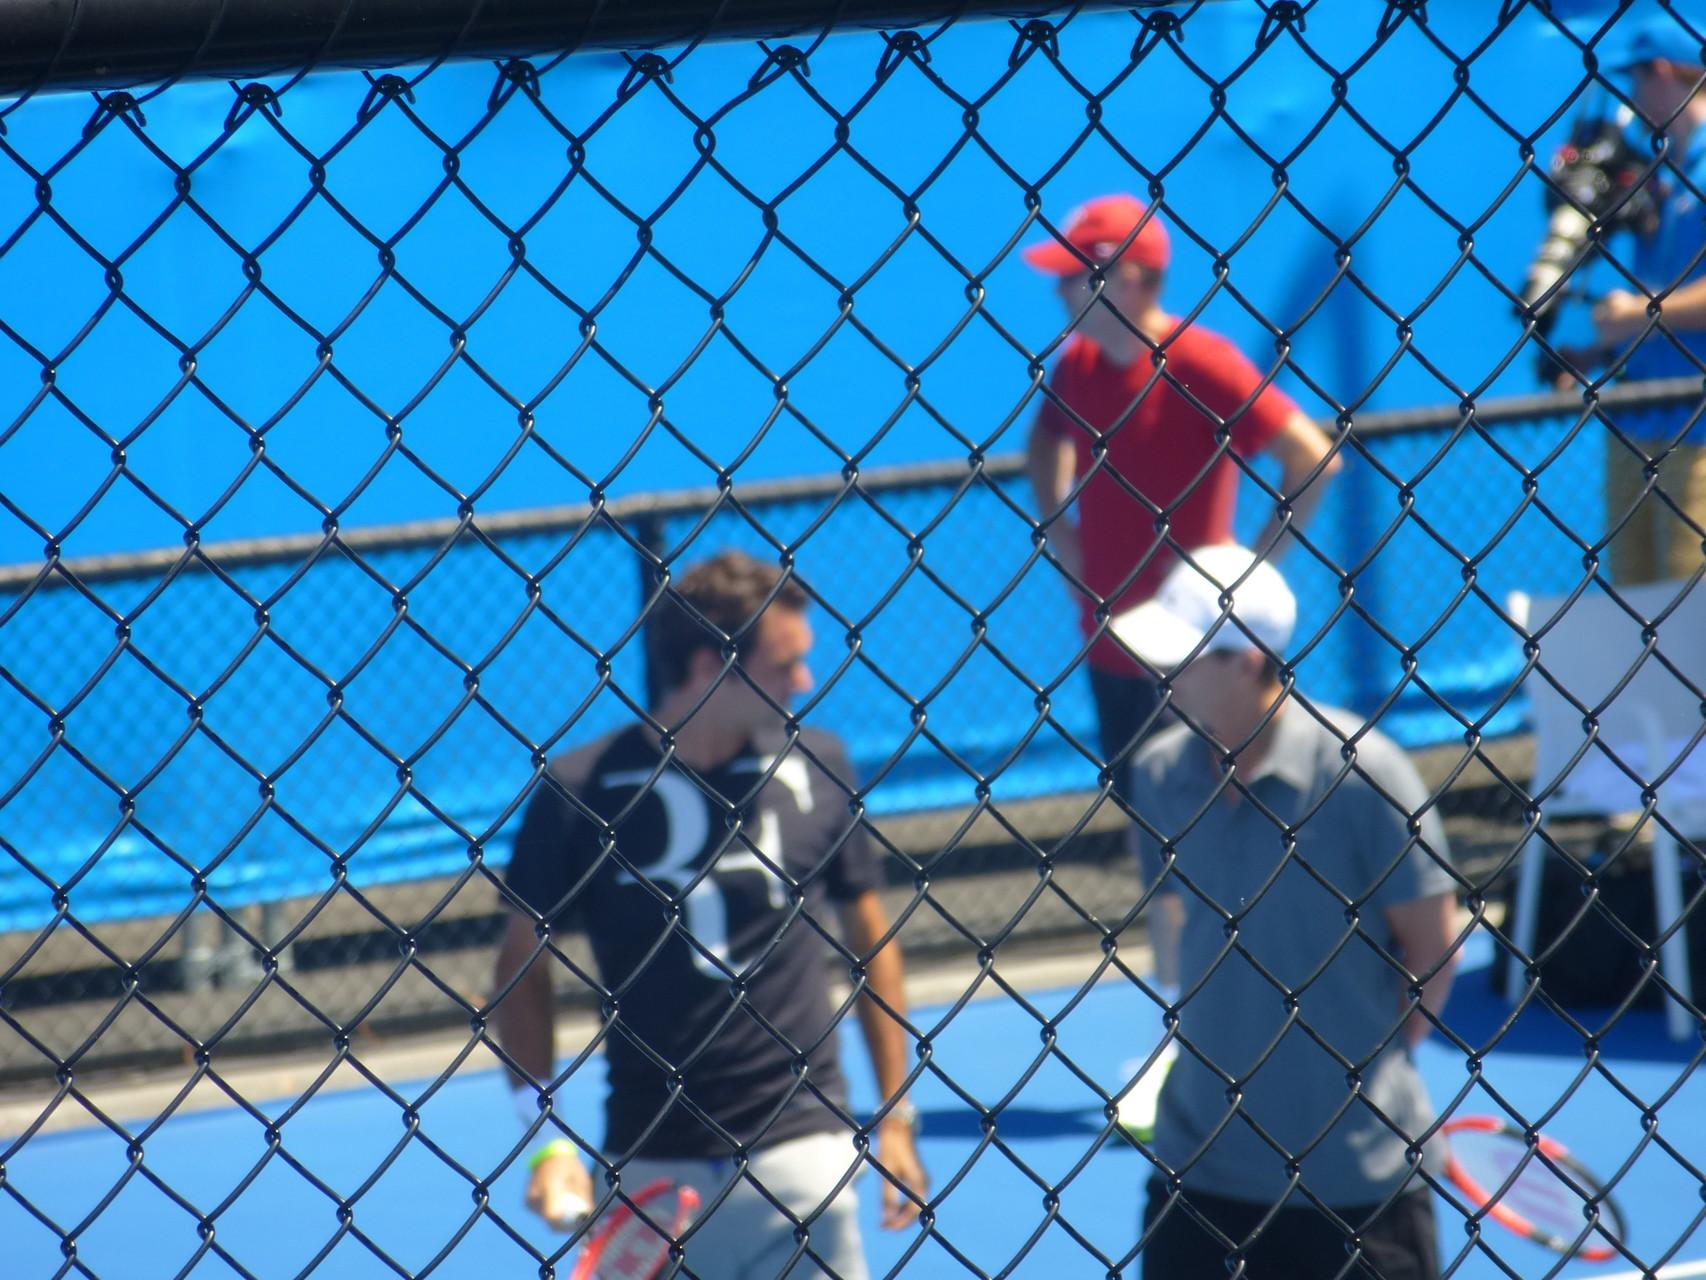 Roger Federer am Trainieren